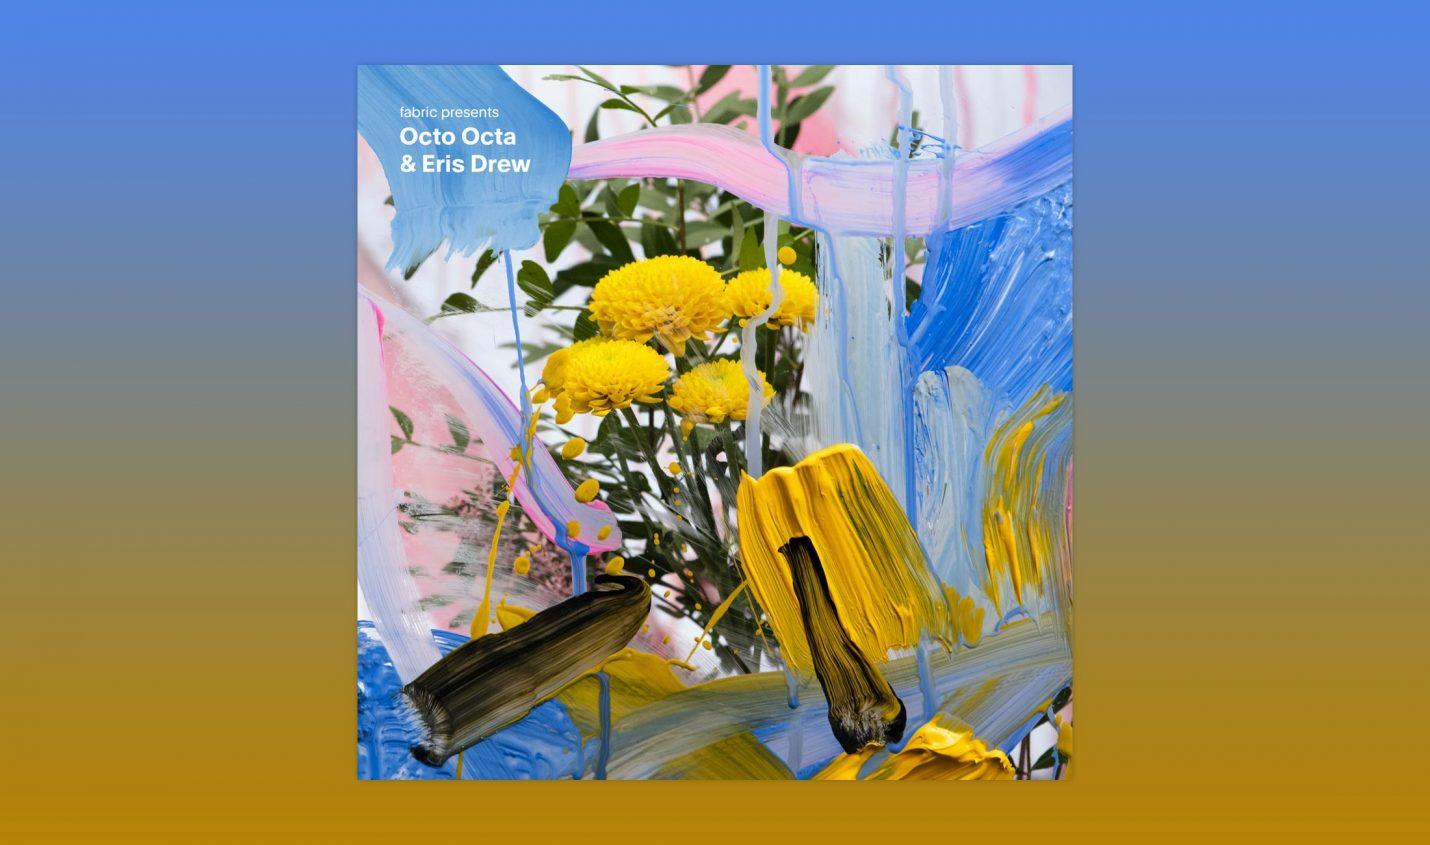 Review: Octo Octa & Eris Drew - Fabric Mix [Fabric]